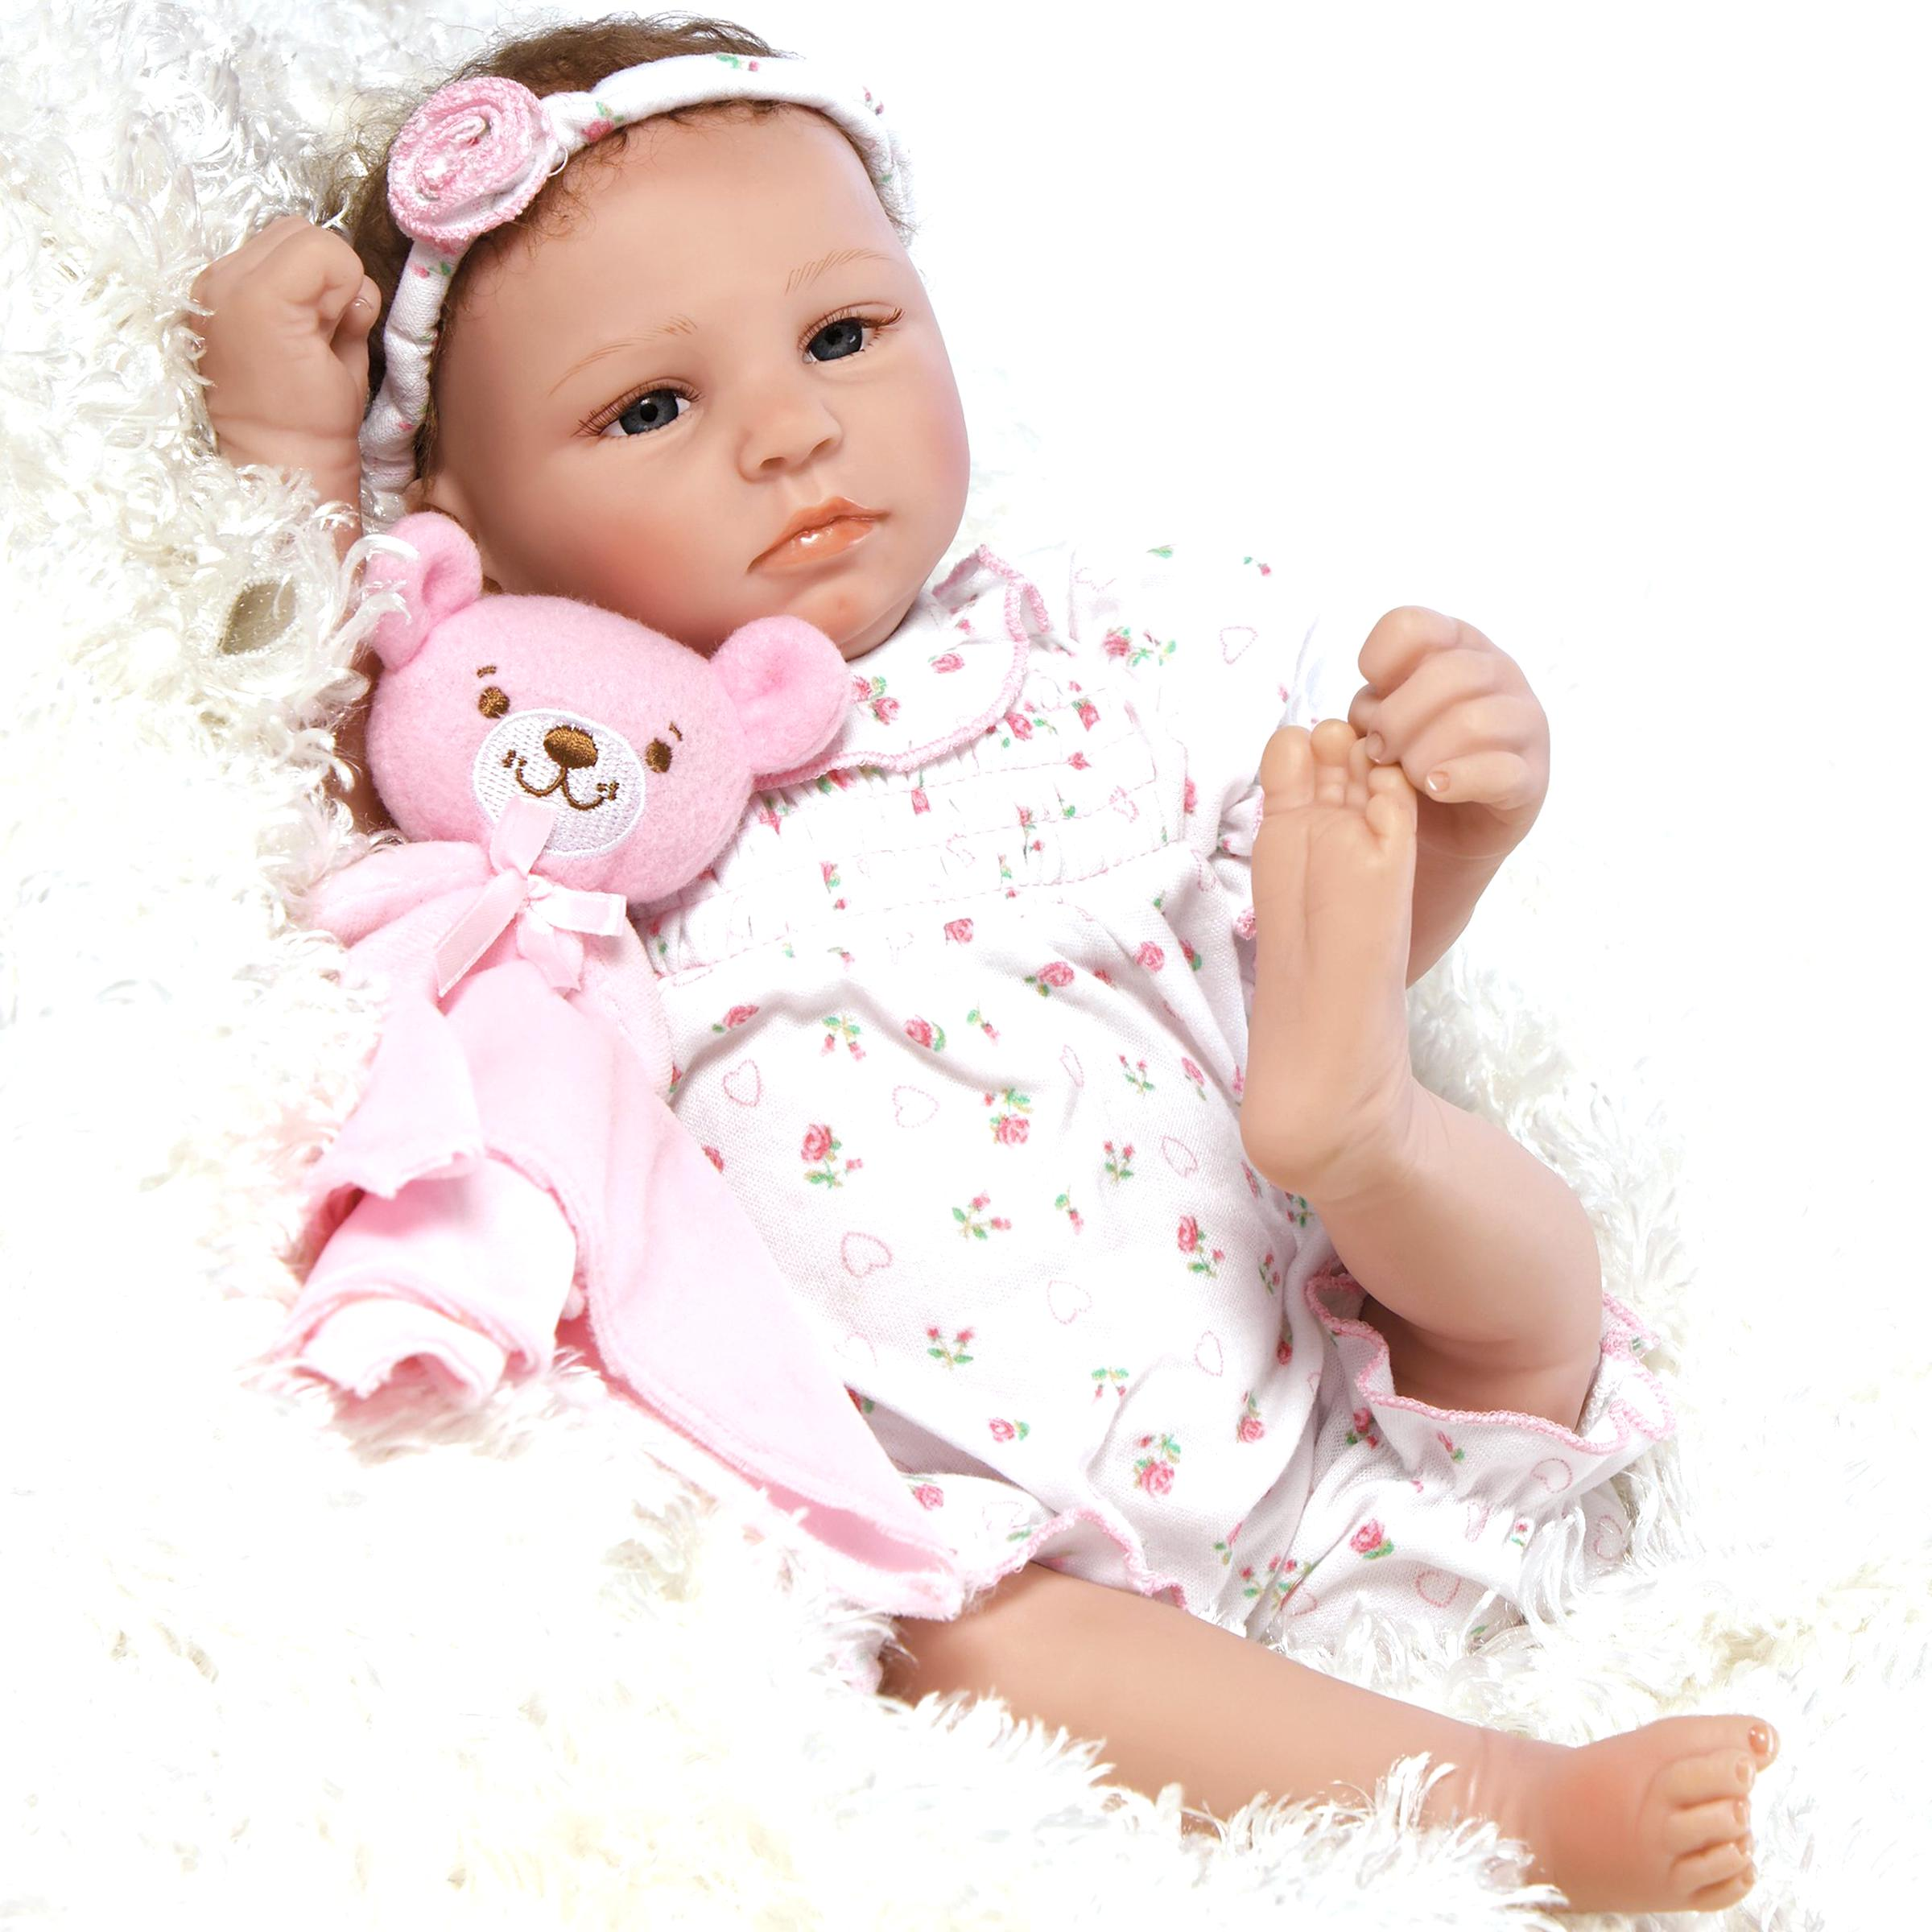 newborn baby dolls for sale